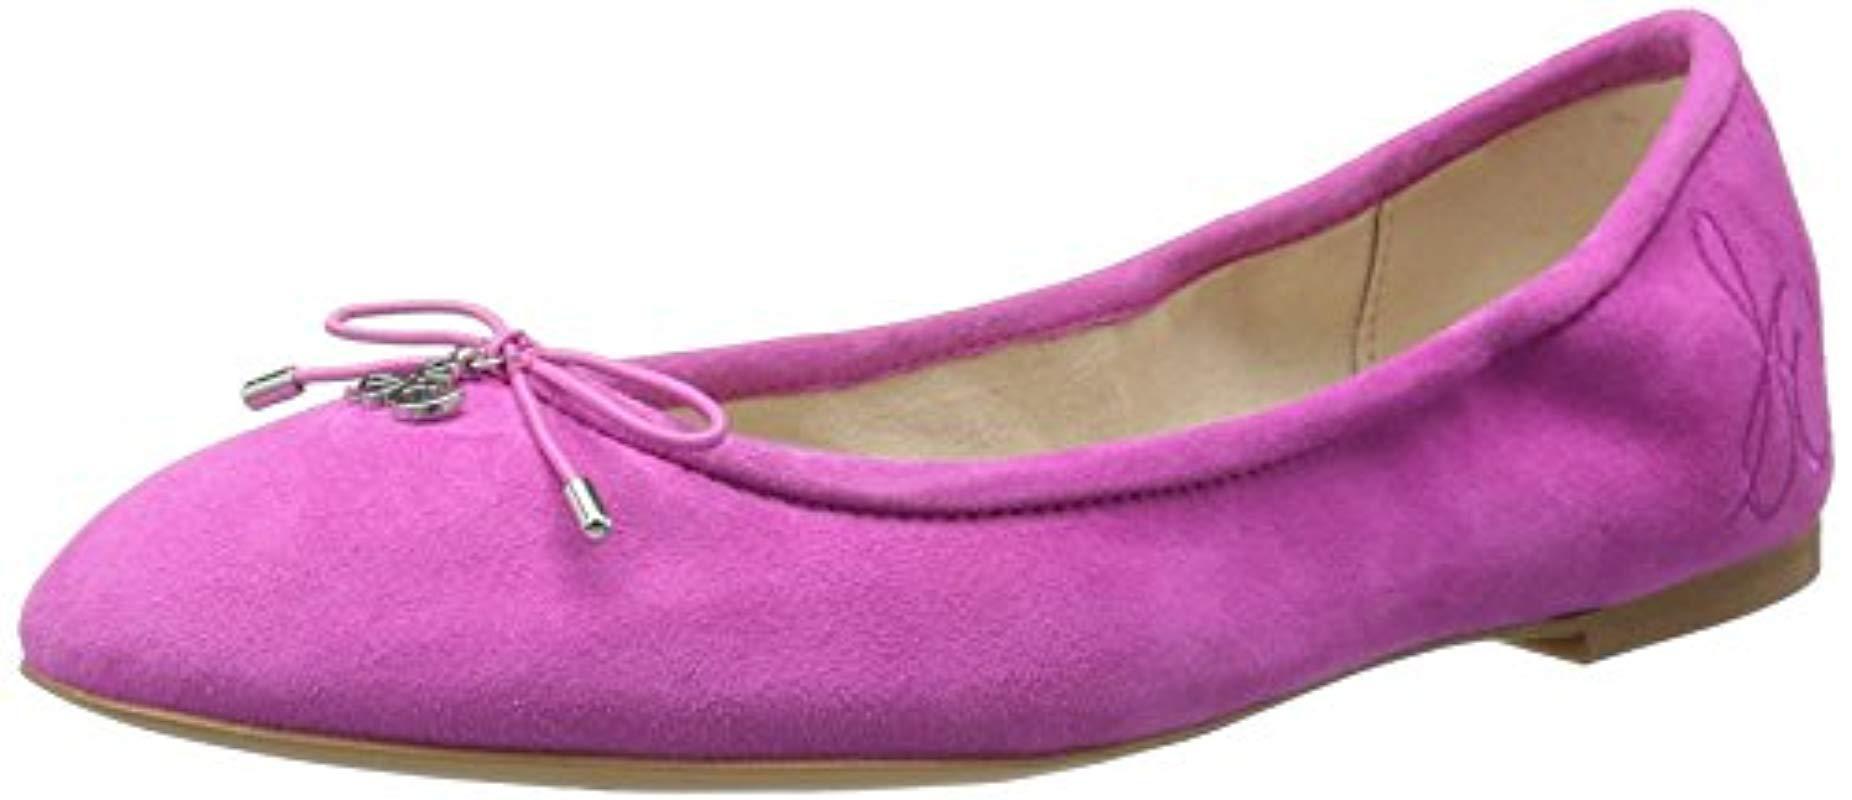 785cc0b3d9ad07 Lyst - Sam Edelman Felicia Ballet Flat in Pink - Save 31%